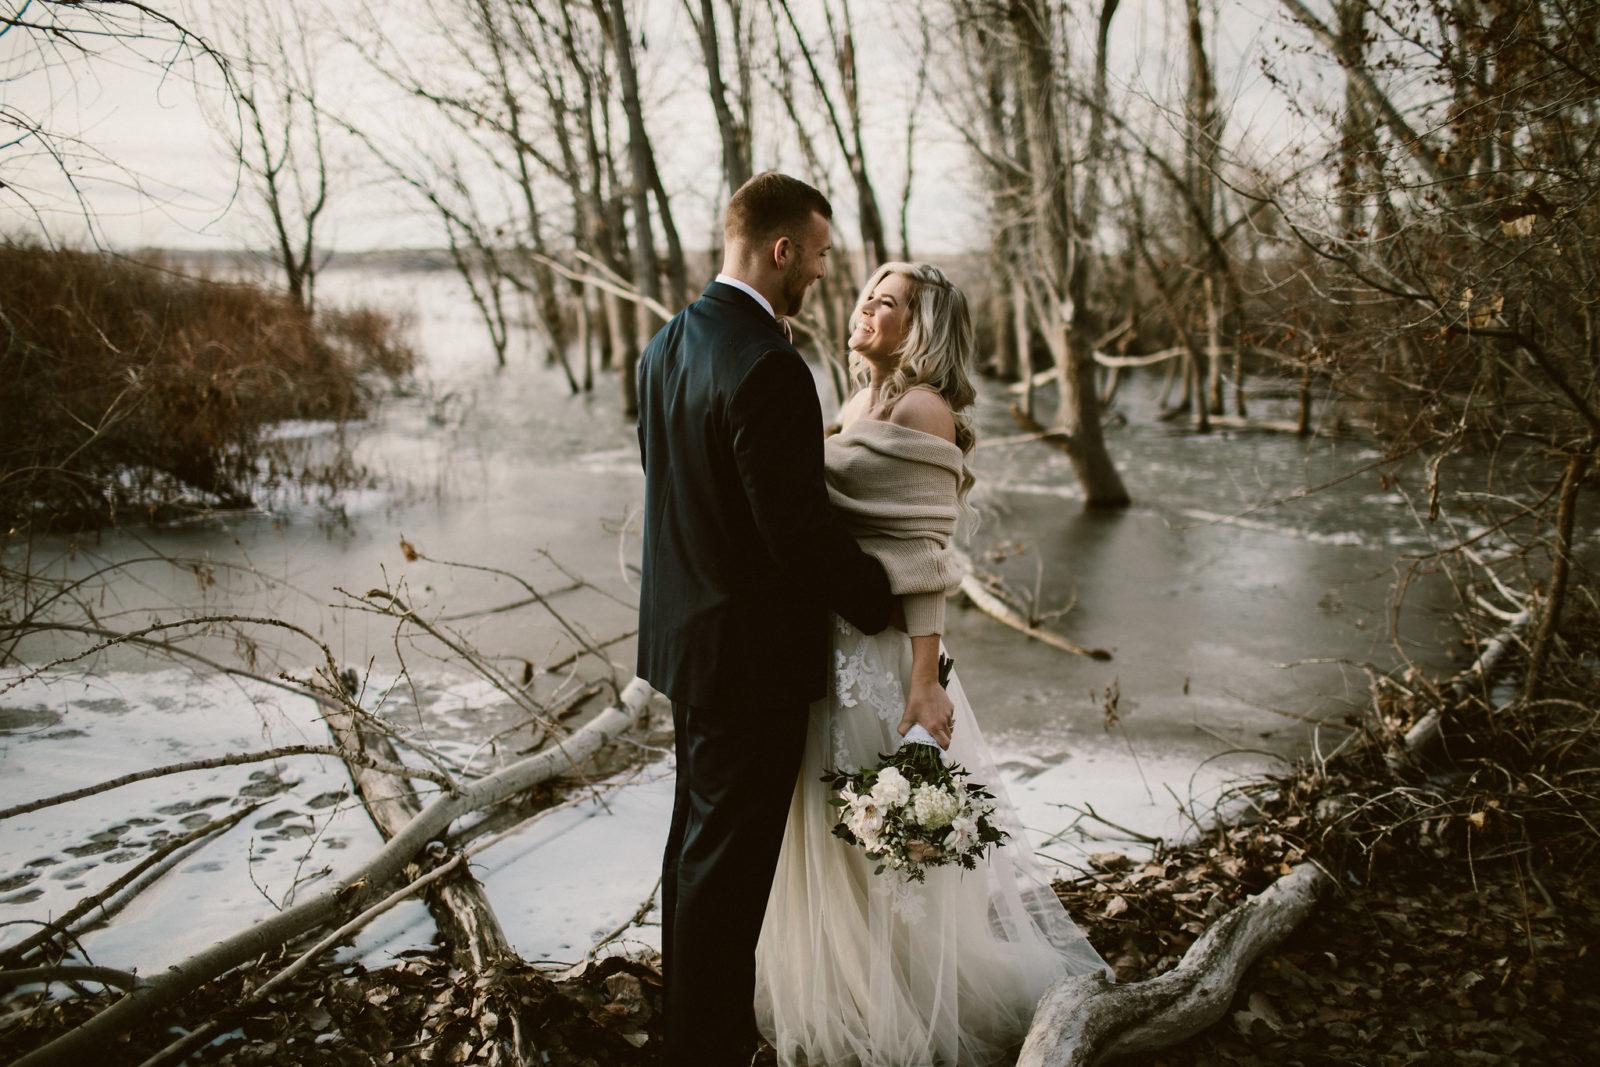 Idaho_wedding_photography_18-1600x1067.jpg